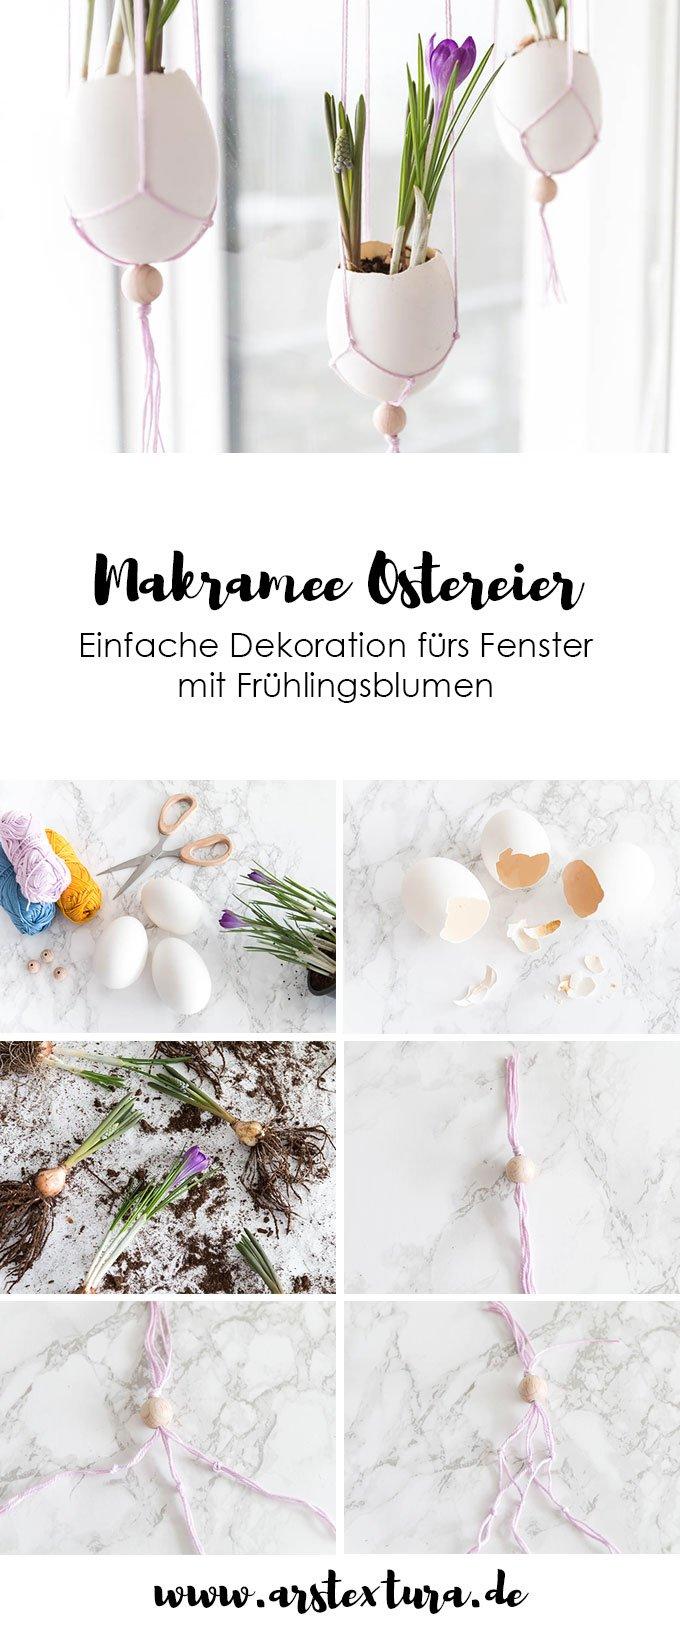 Fenster Dekoration Ostern: Makramee Ostereier mit Frühlingsblumen basteln | Ostern basteln | Ostern Dekoration | DIY Anleitung Makramee | ars textura - DIY Blog